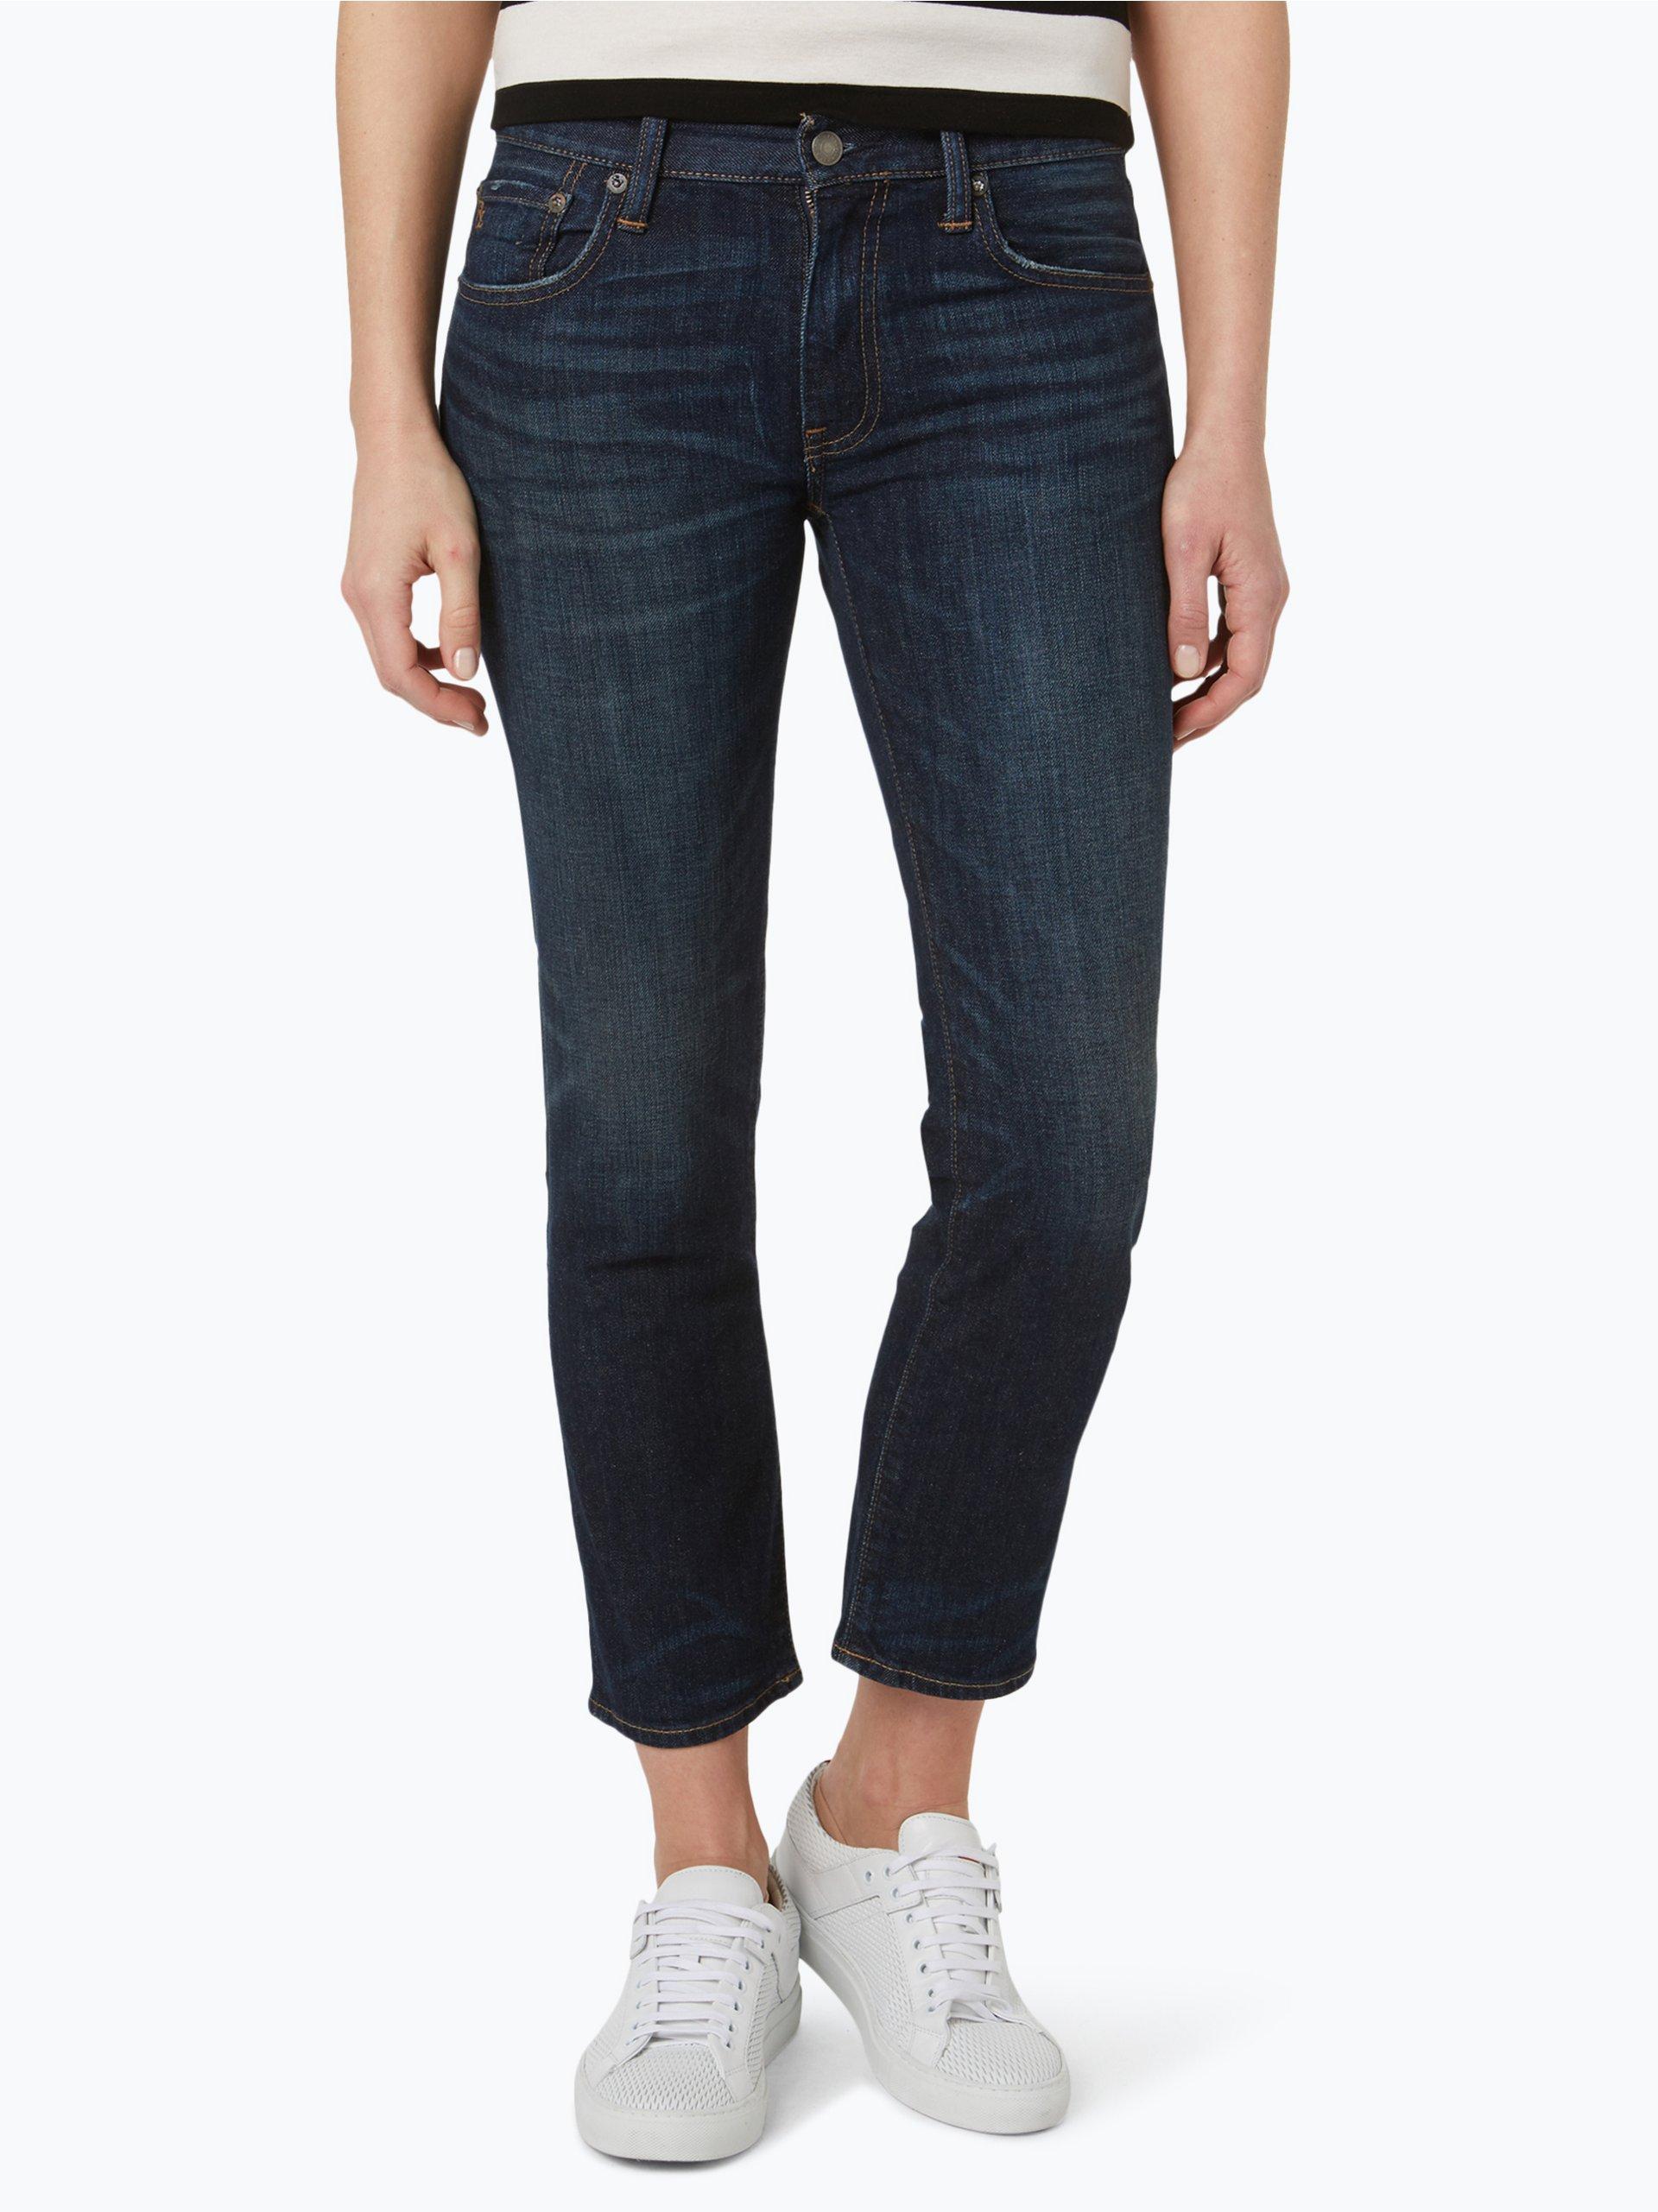 polo ralph lauren damen jeans dark stone uni online kaufen. Black Bedroom Furniture Sets. Home Design Ideas